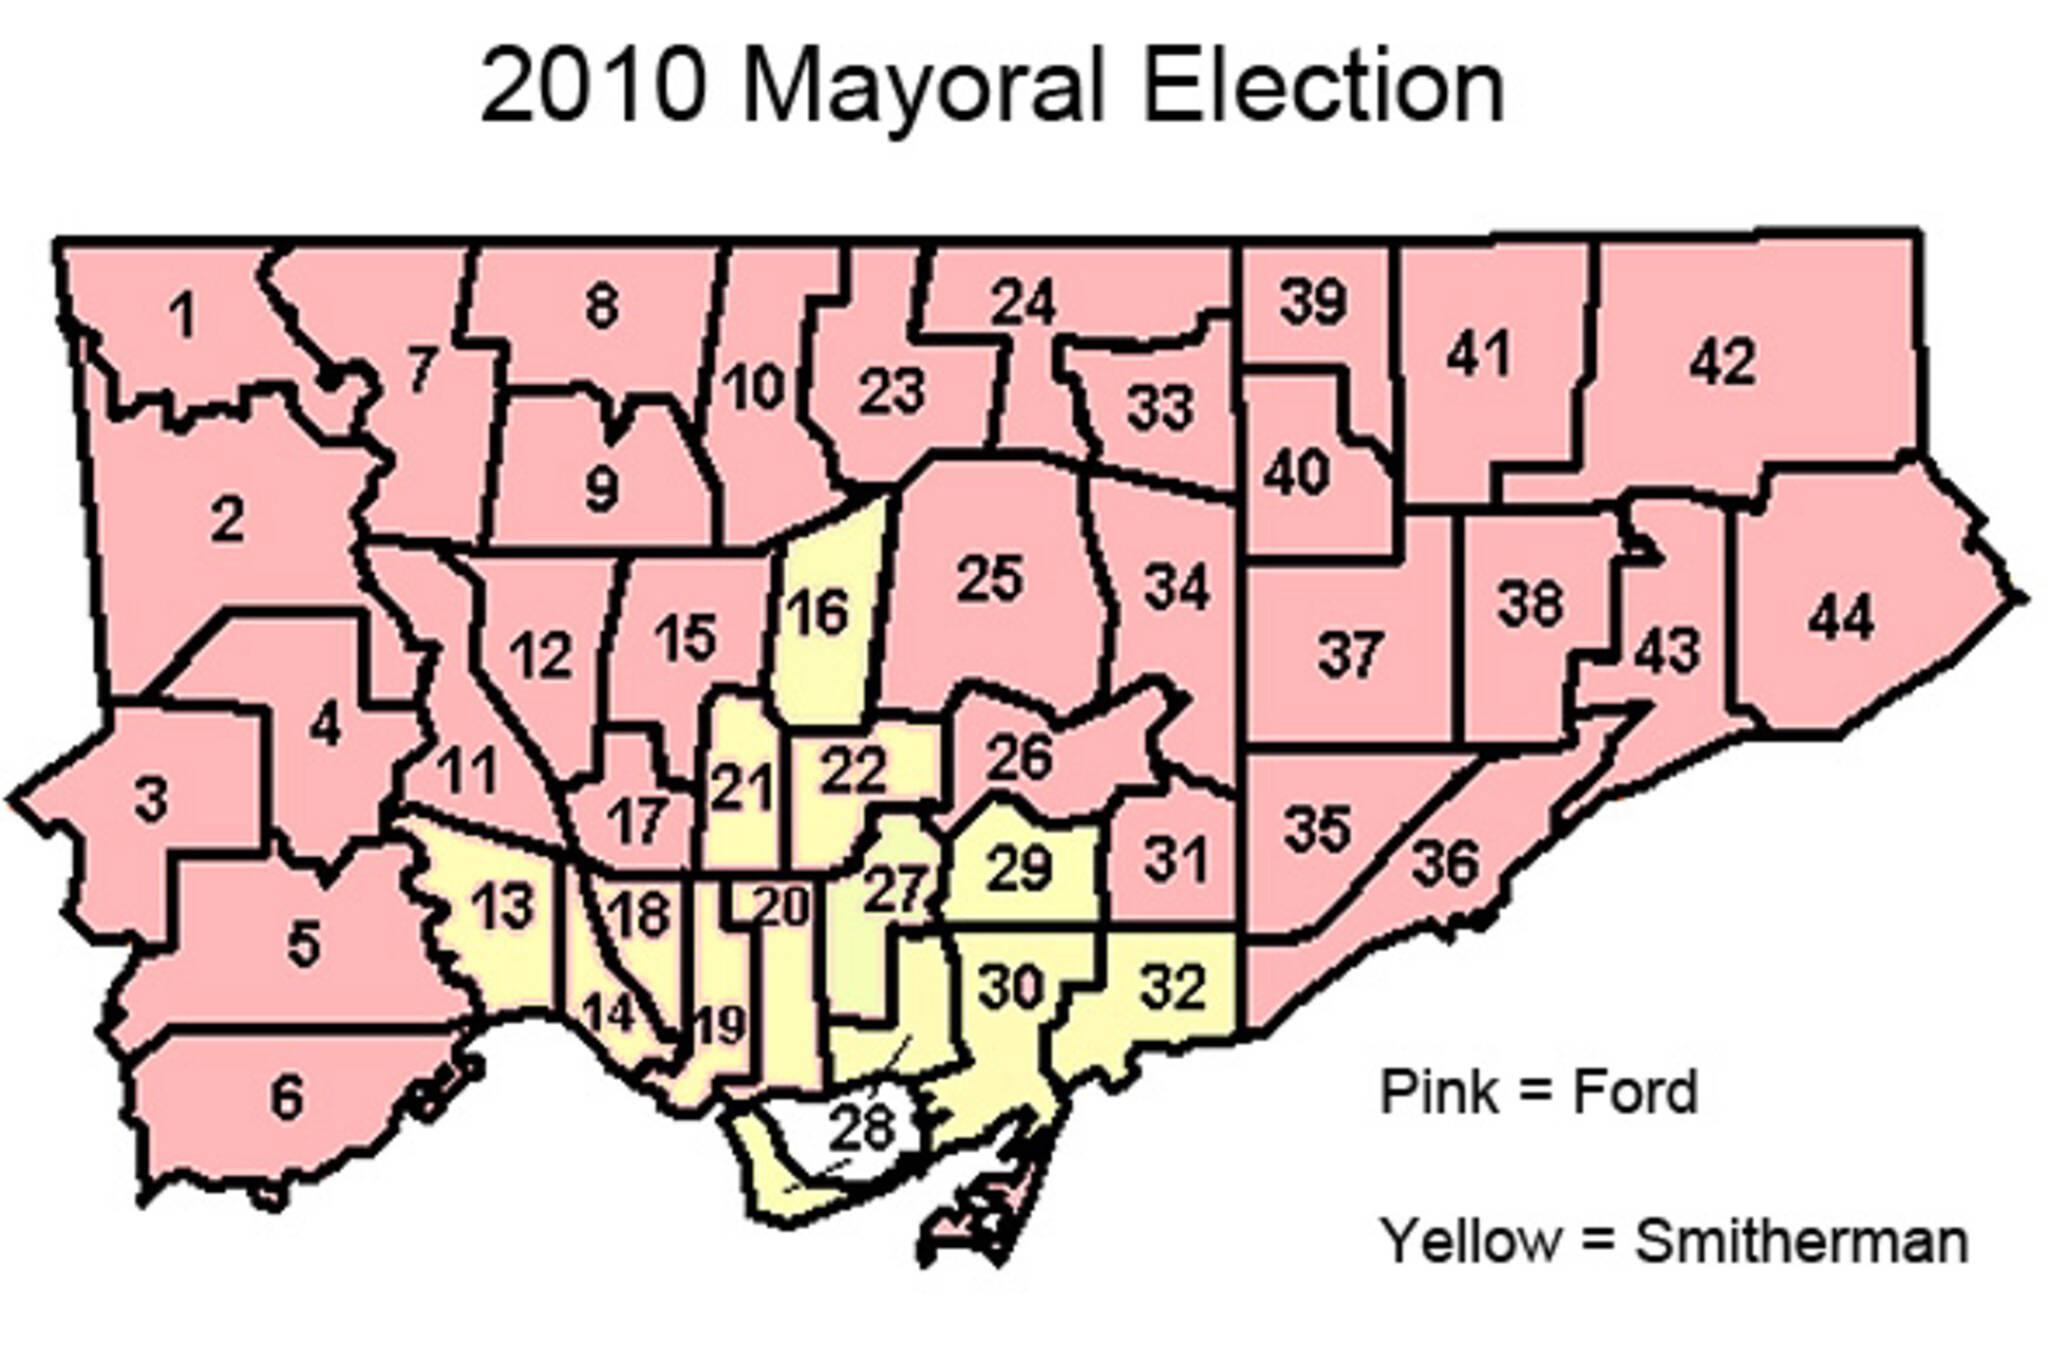 toronto election results 2010